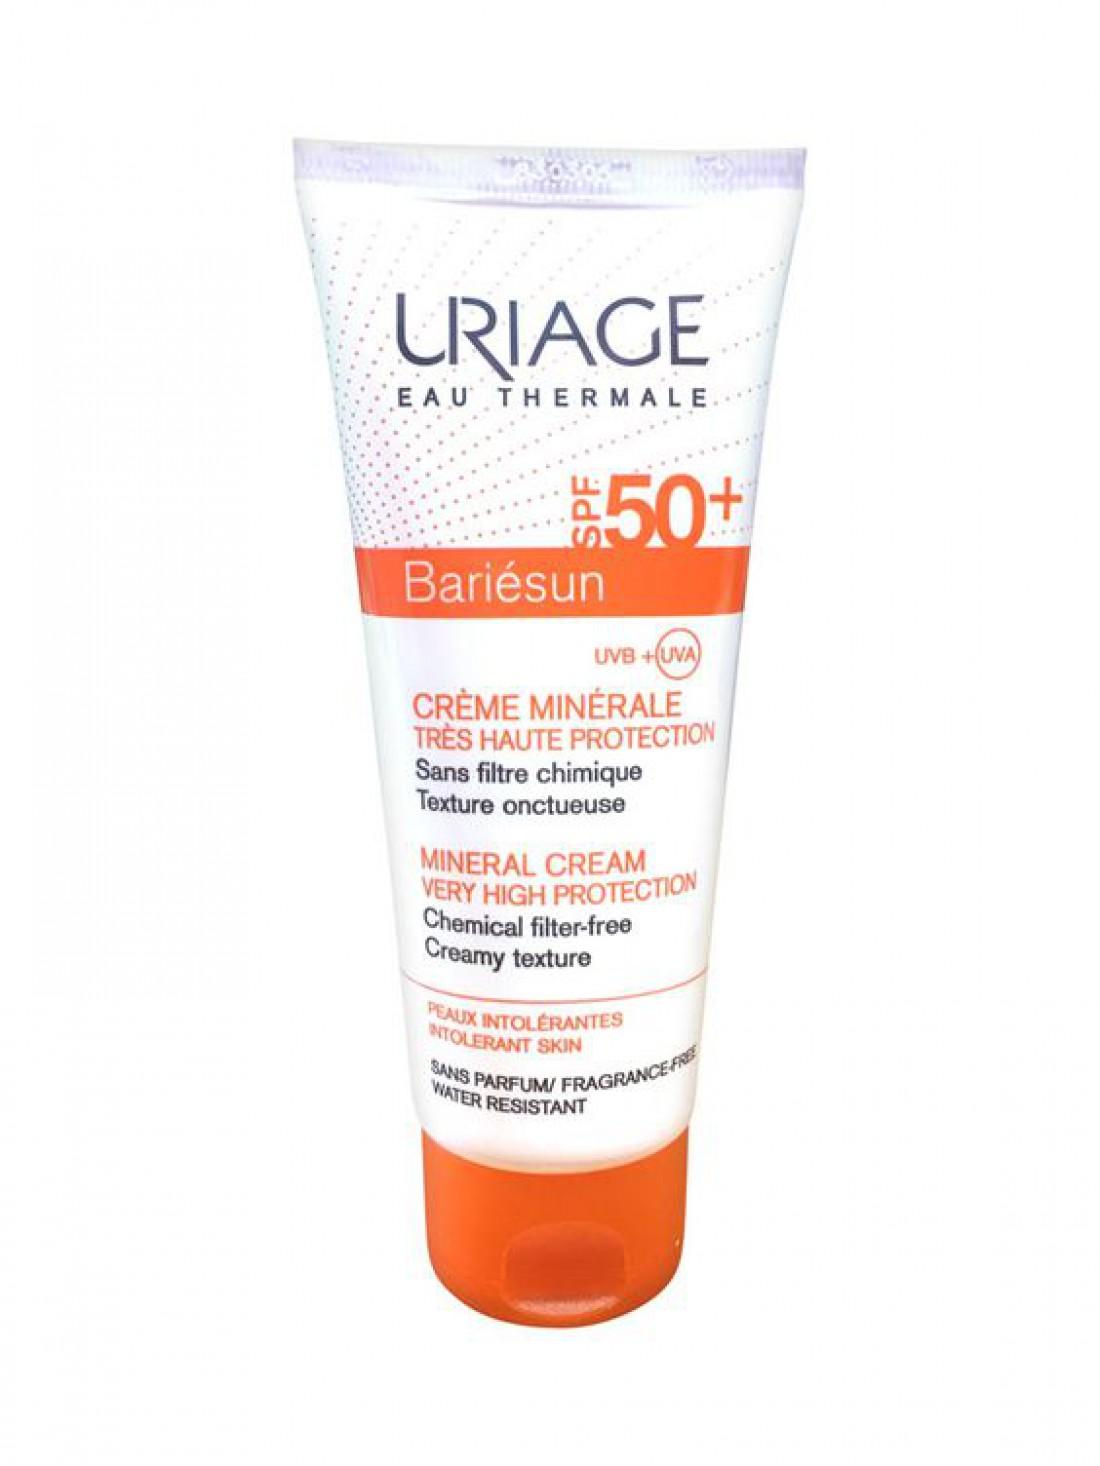 Uriage Bariésun Crème Minérale SPF 50+